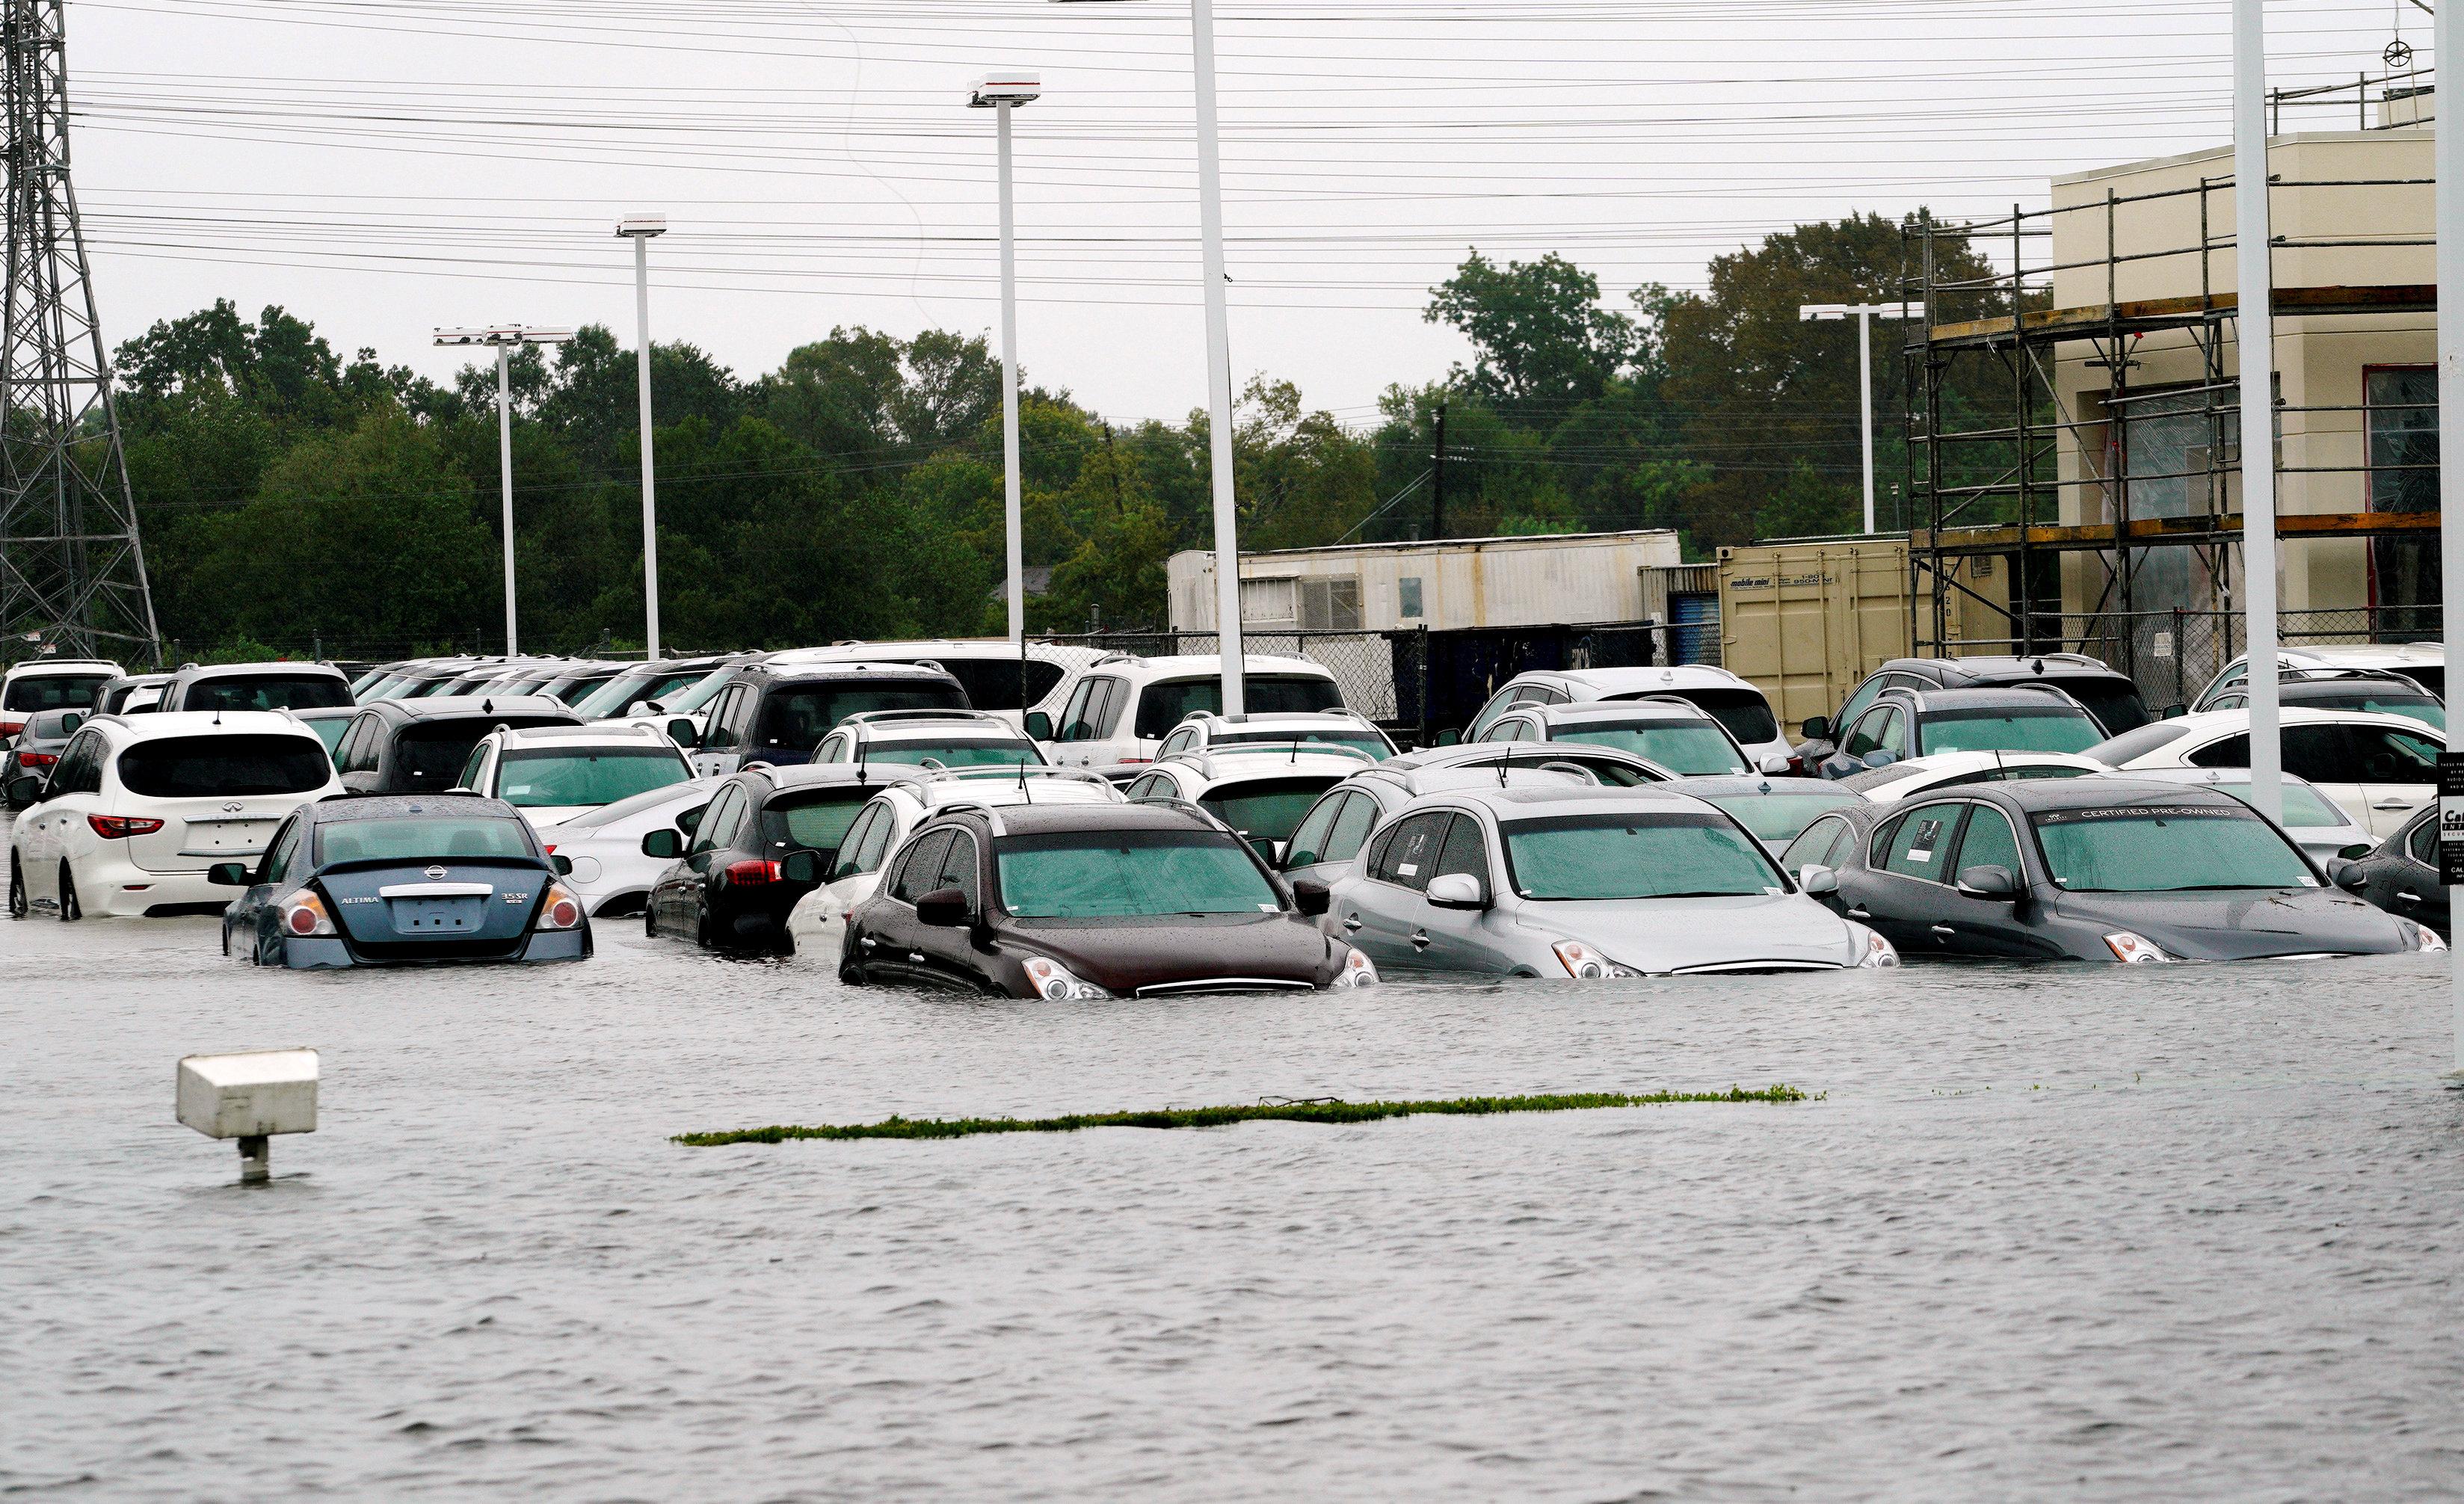 Texas gives Houston $50 million for Hurricane Harvey costs